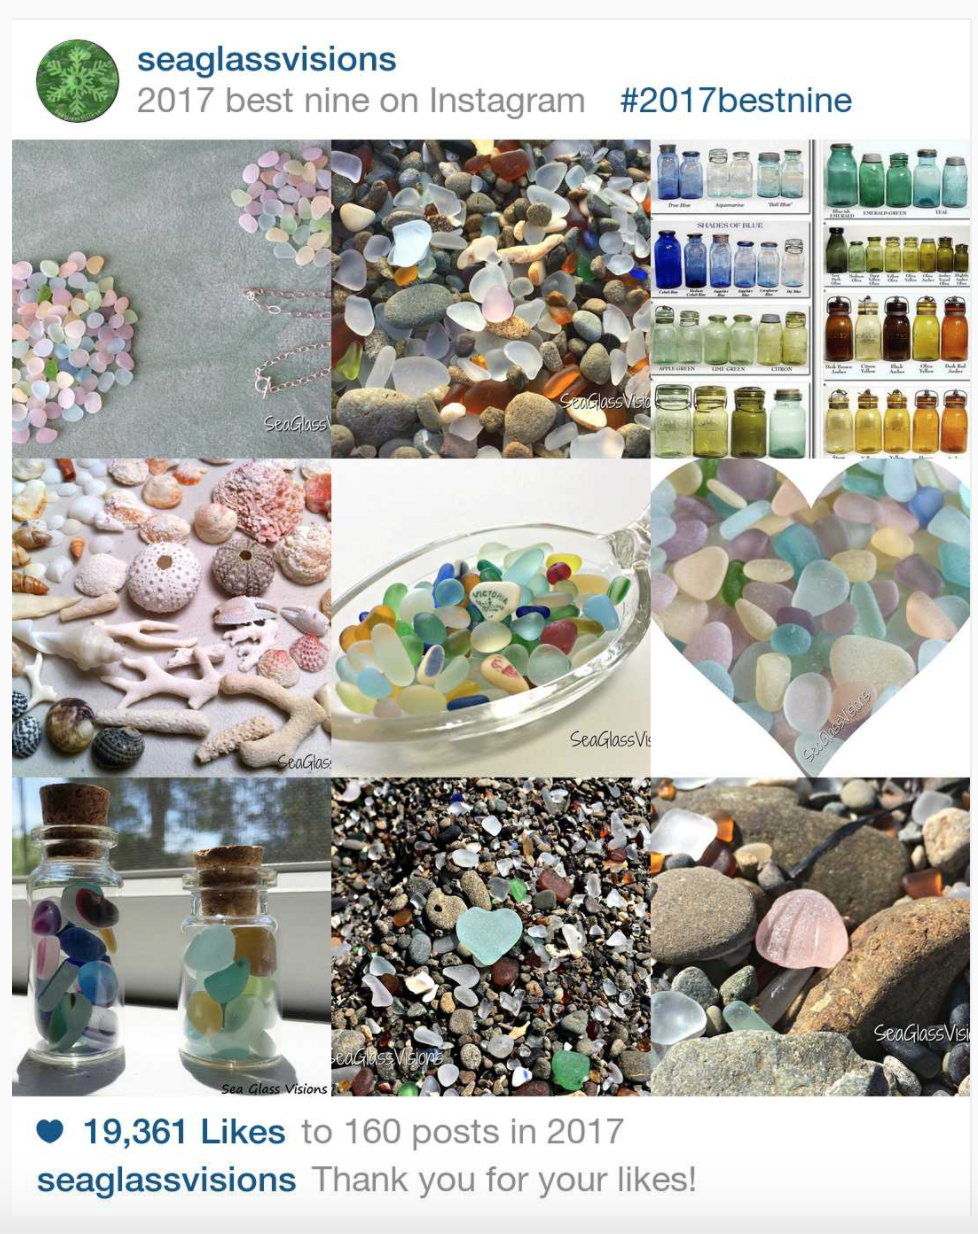 2017 Best Nine on Instagram for Sea Glass Visions